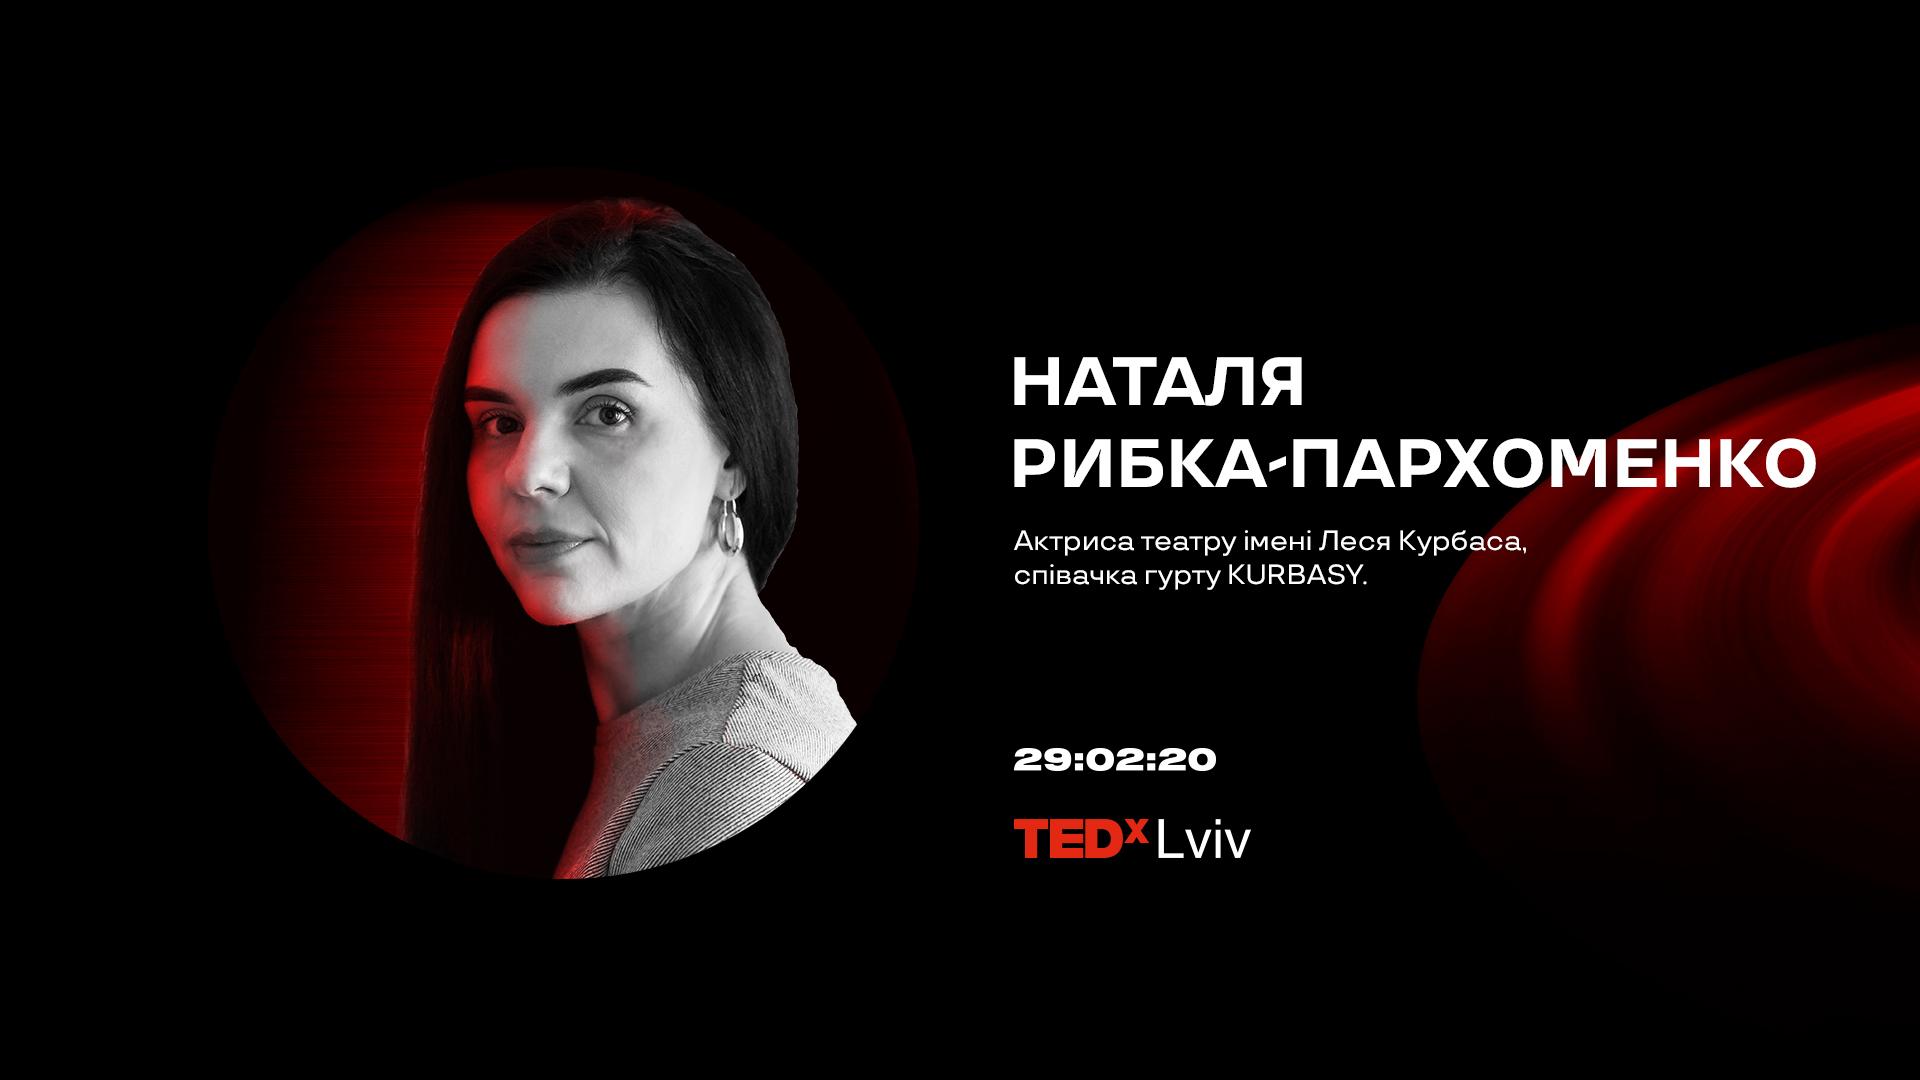 Наталя Рибка-Пархоменко